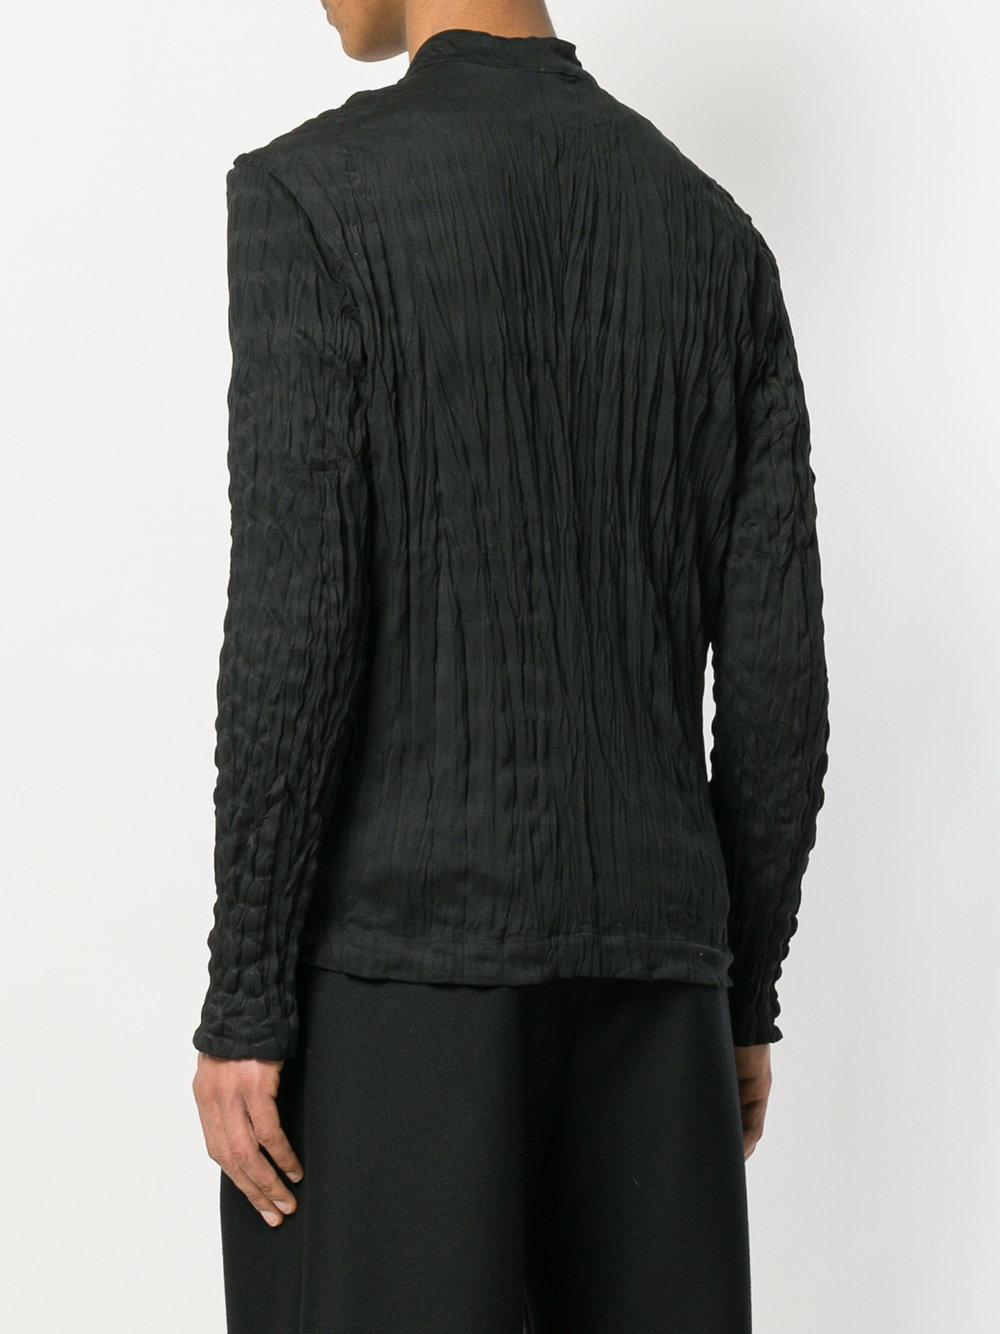 Issey Miyake Crinkled Zip-up Jacket in Black for Men